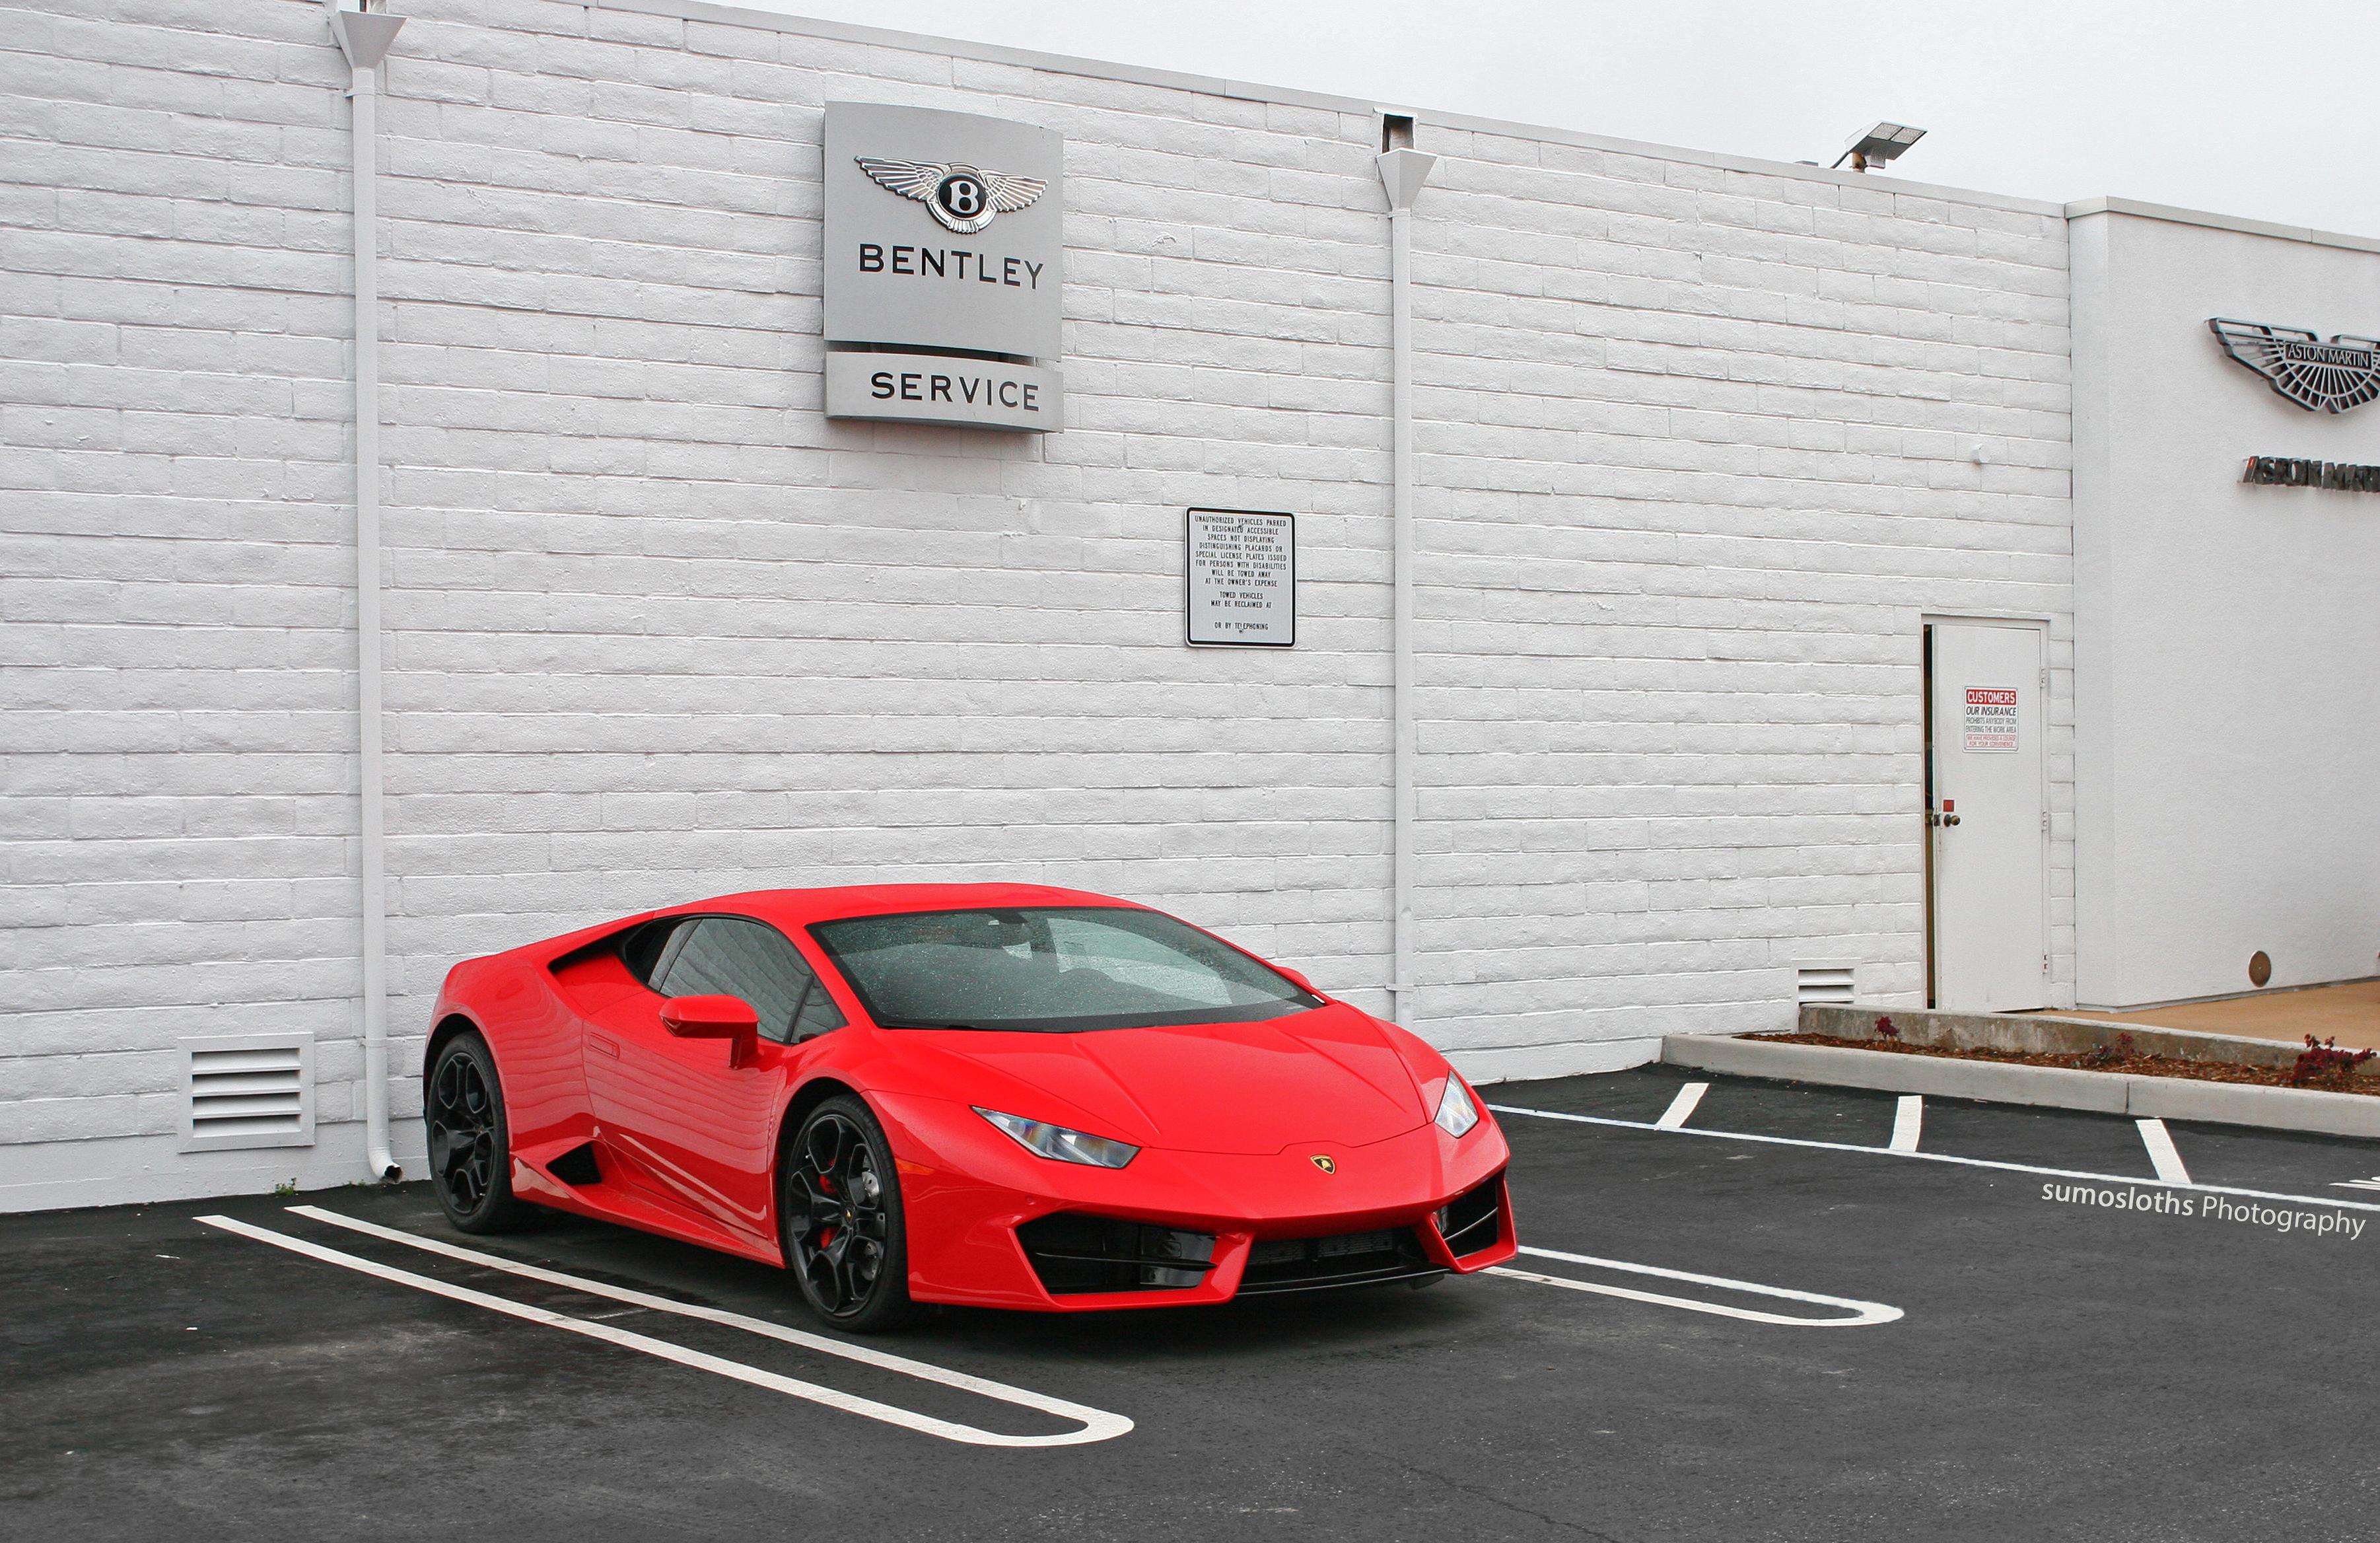 Wallpaper : California, New, Light, Red, Mars, White, Cars, Rain, Wheel,  Fog, Wall, Drive, Bay, Los, San, Martin, Cloudy, Parking, Jose, Rear,  Version, Lot, ...